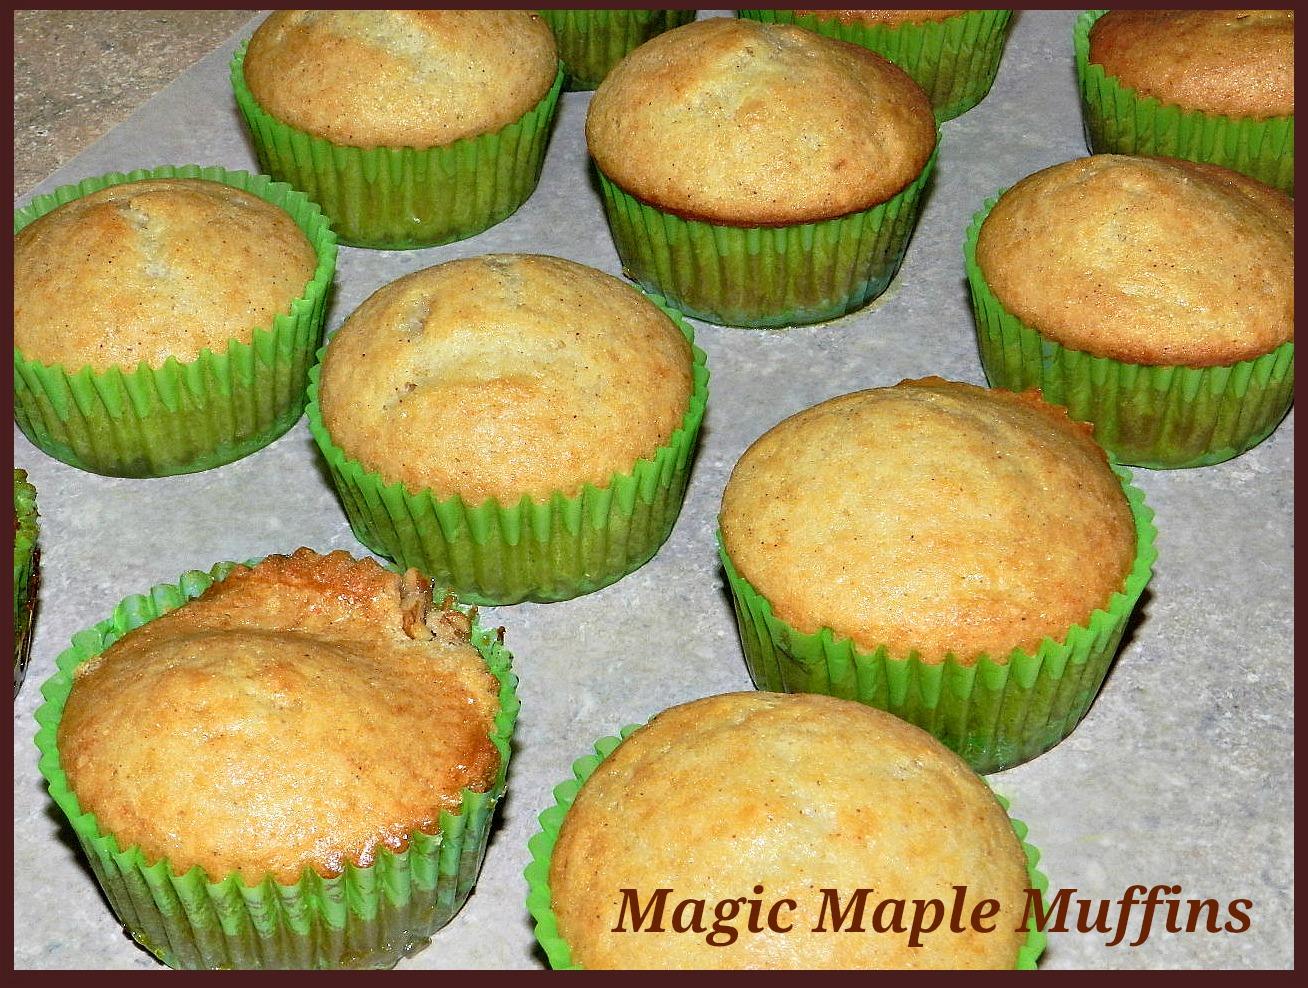 Magic Maple Muffins